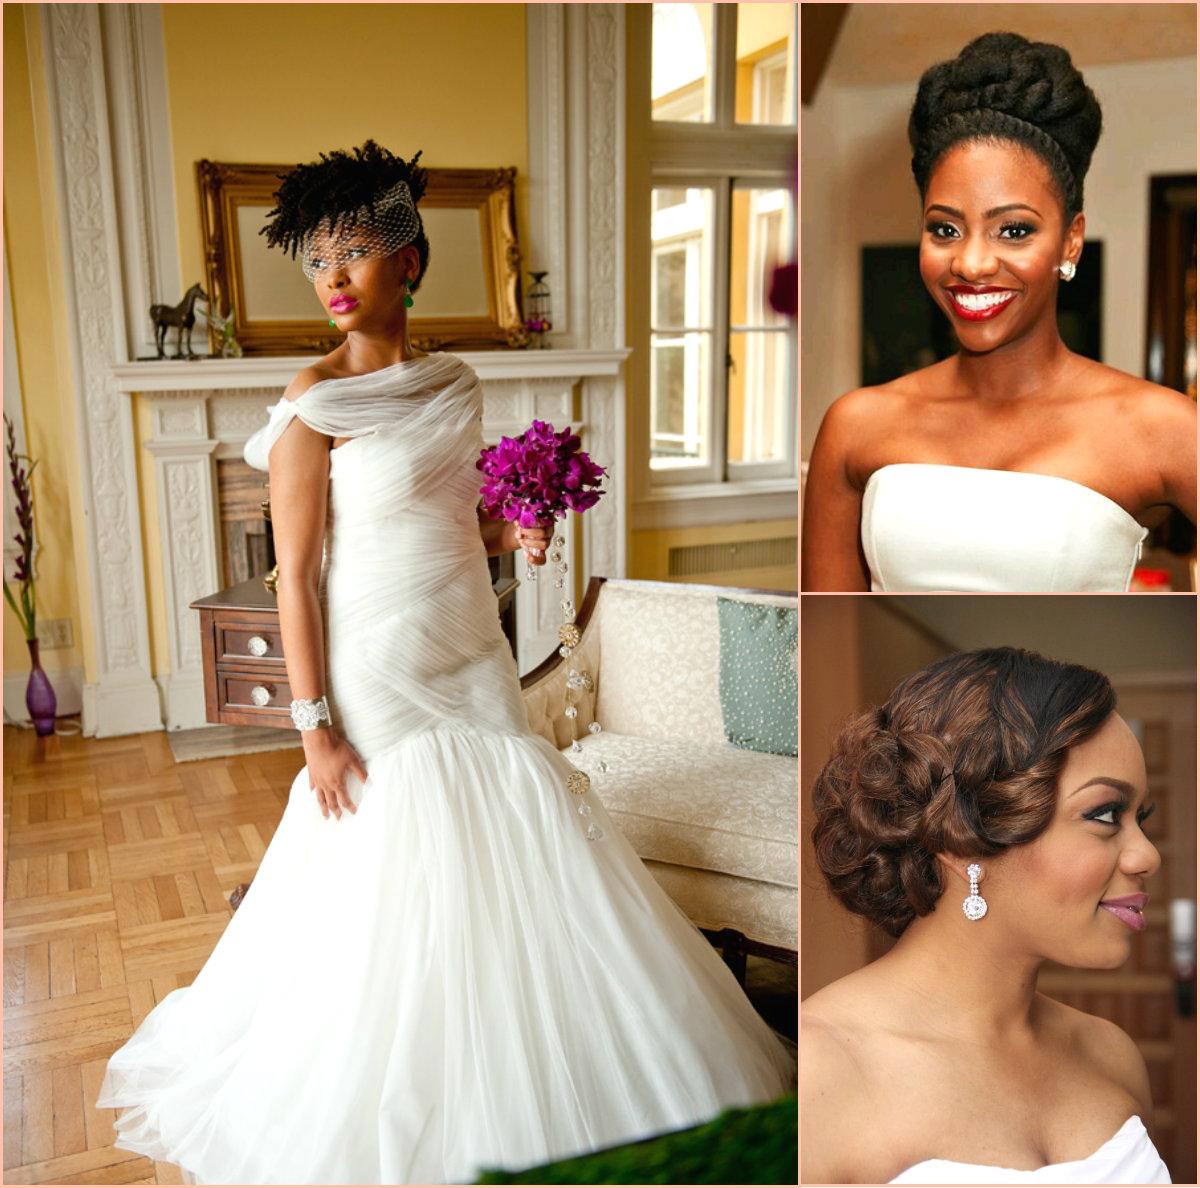 Superb Charming Black Women Wedding Hairstyles Hairstyles 2017 Hair Short Hairstyles Gunalazisus